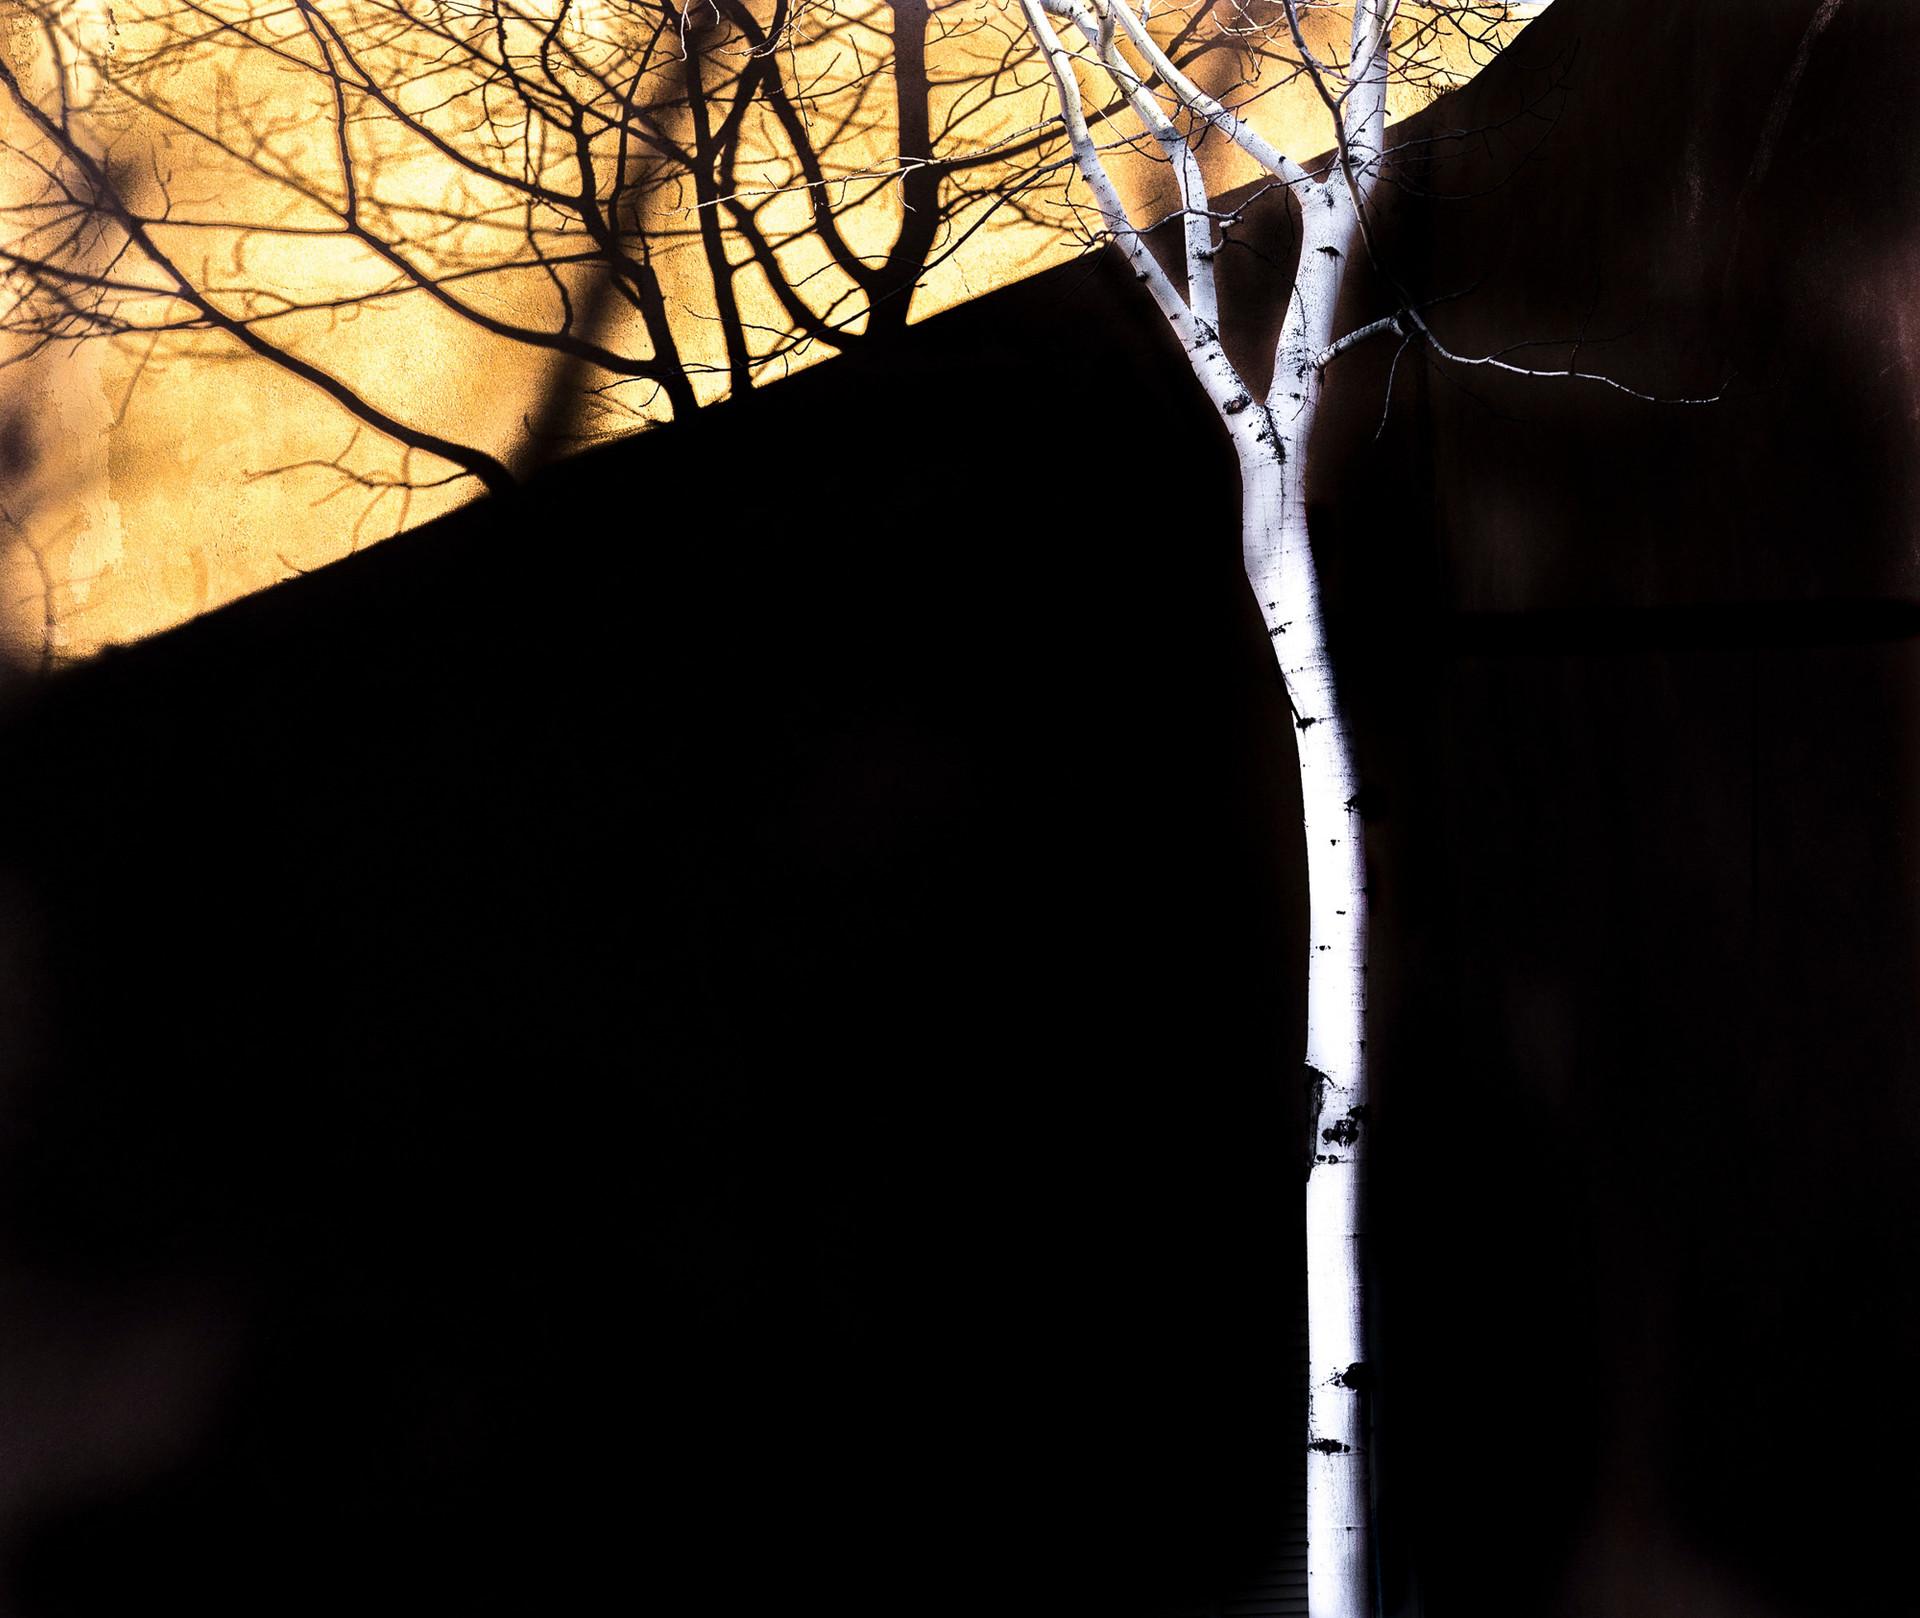 Siddho-Photography-WS-C-17.jpg